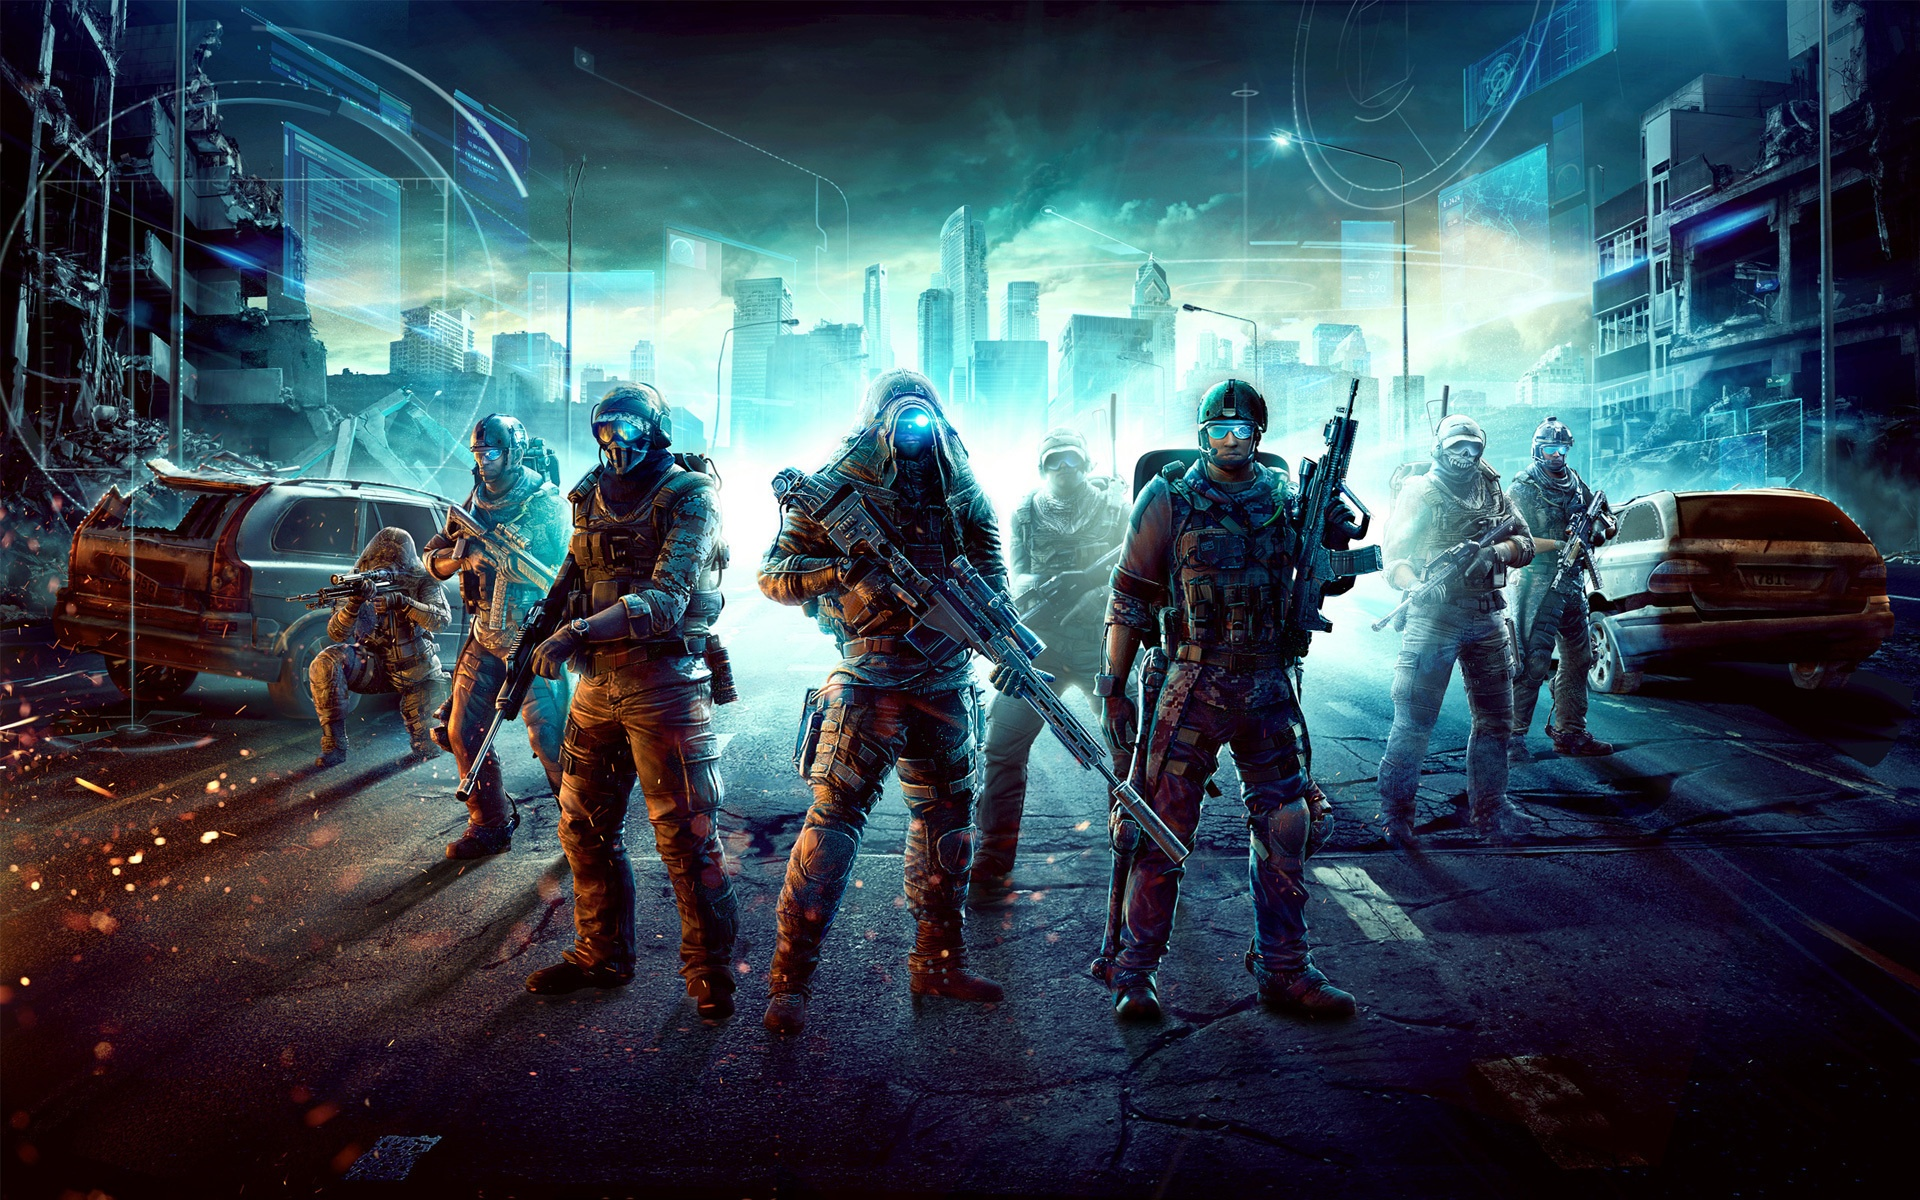 ghost recon future soldier desktop wallpaper 49041